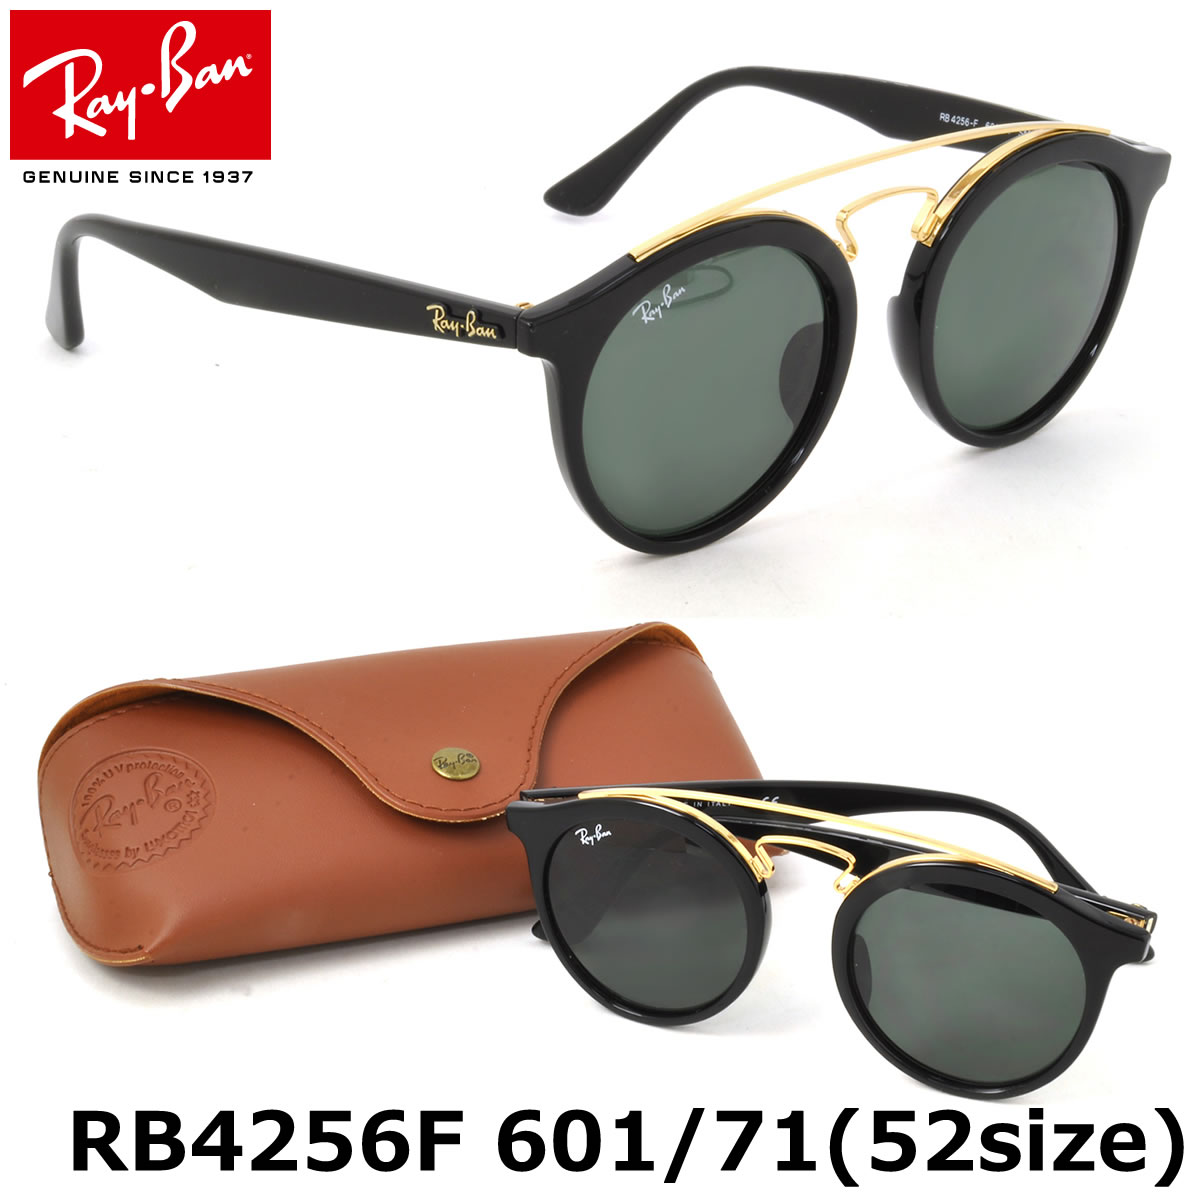 3278a7cc826 Optical Shop Thats  Ray-Ban Sunglasses RB4256F 601 71 52size GATSBY ...